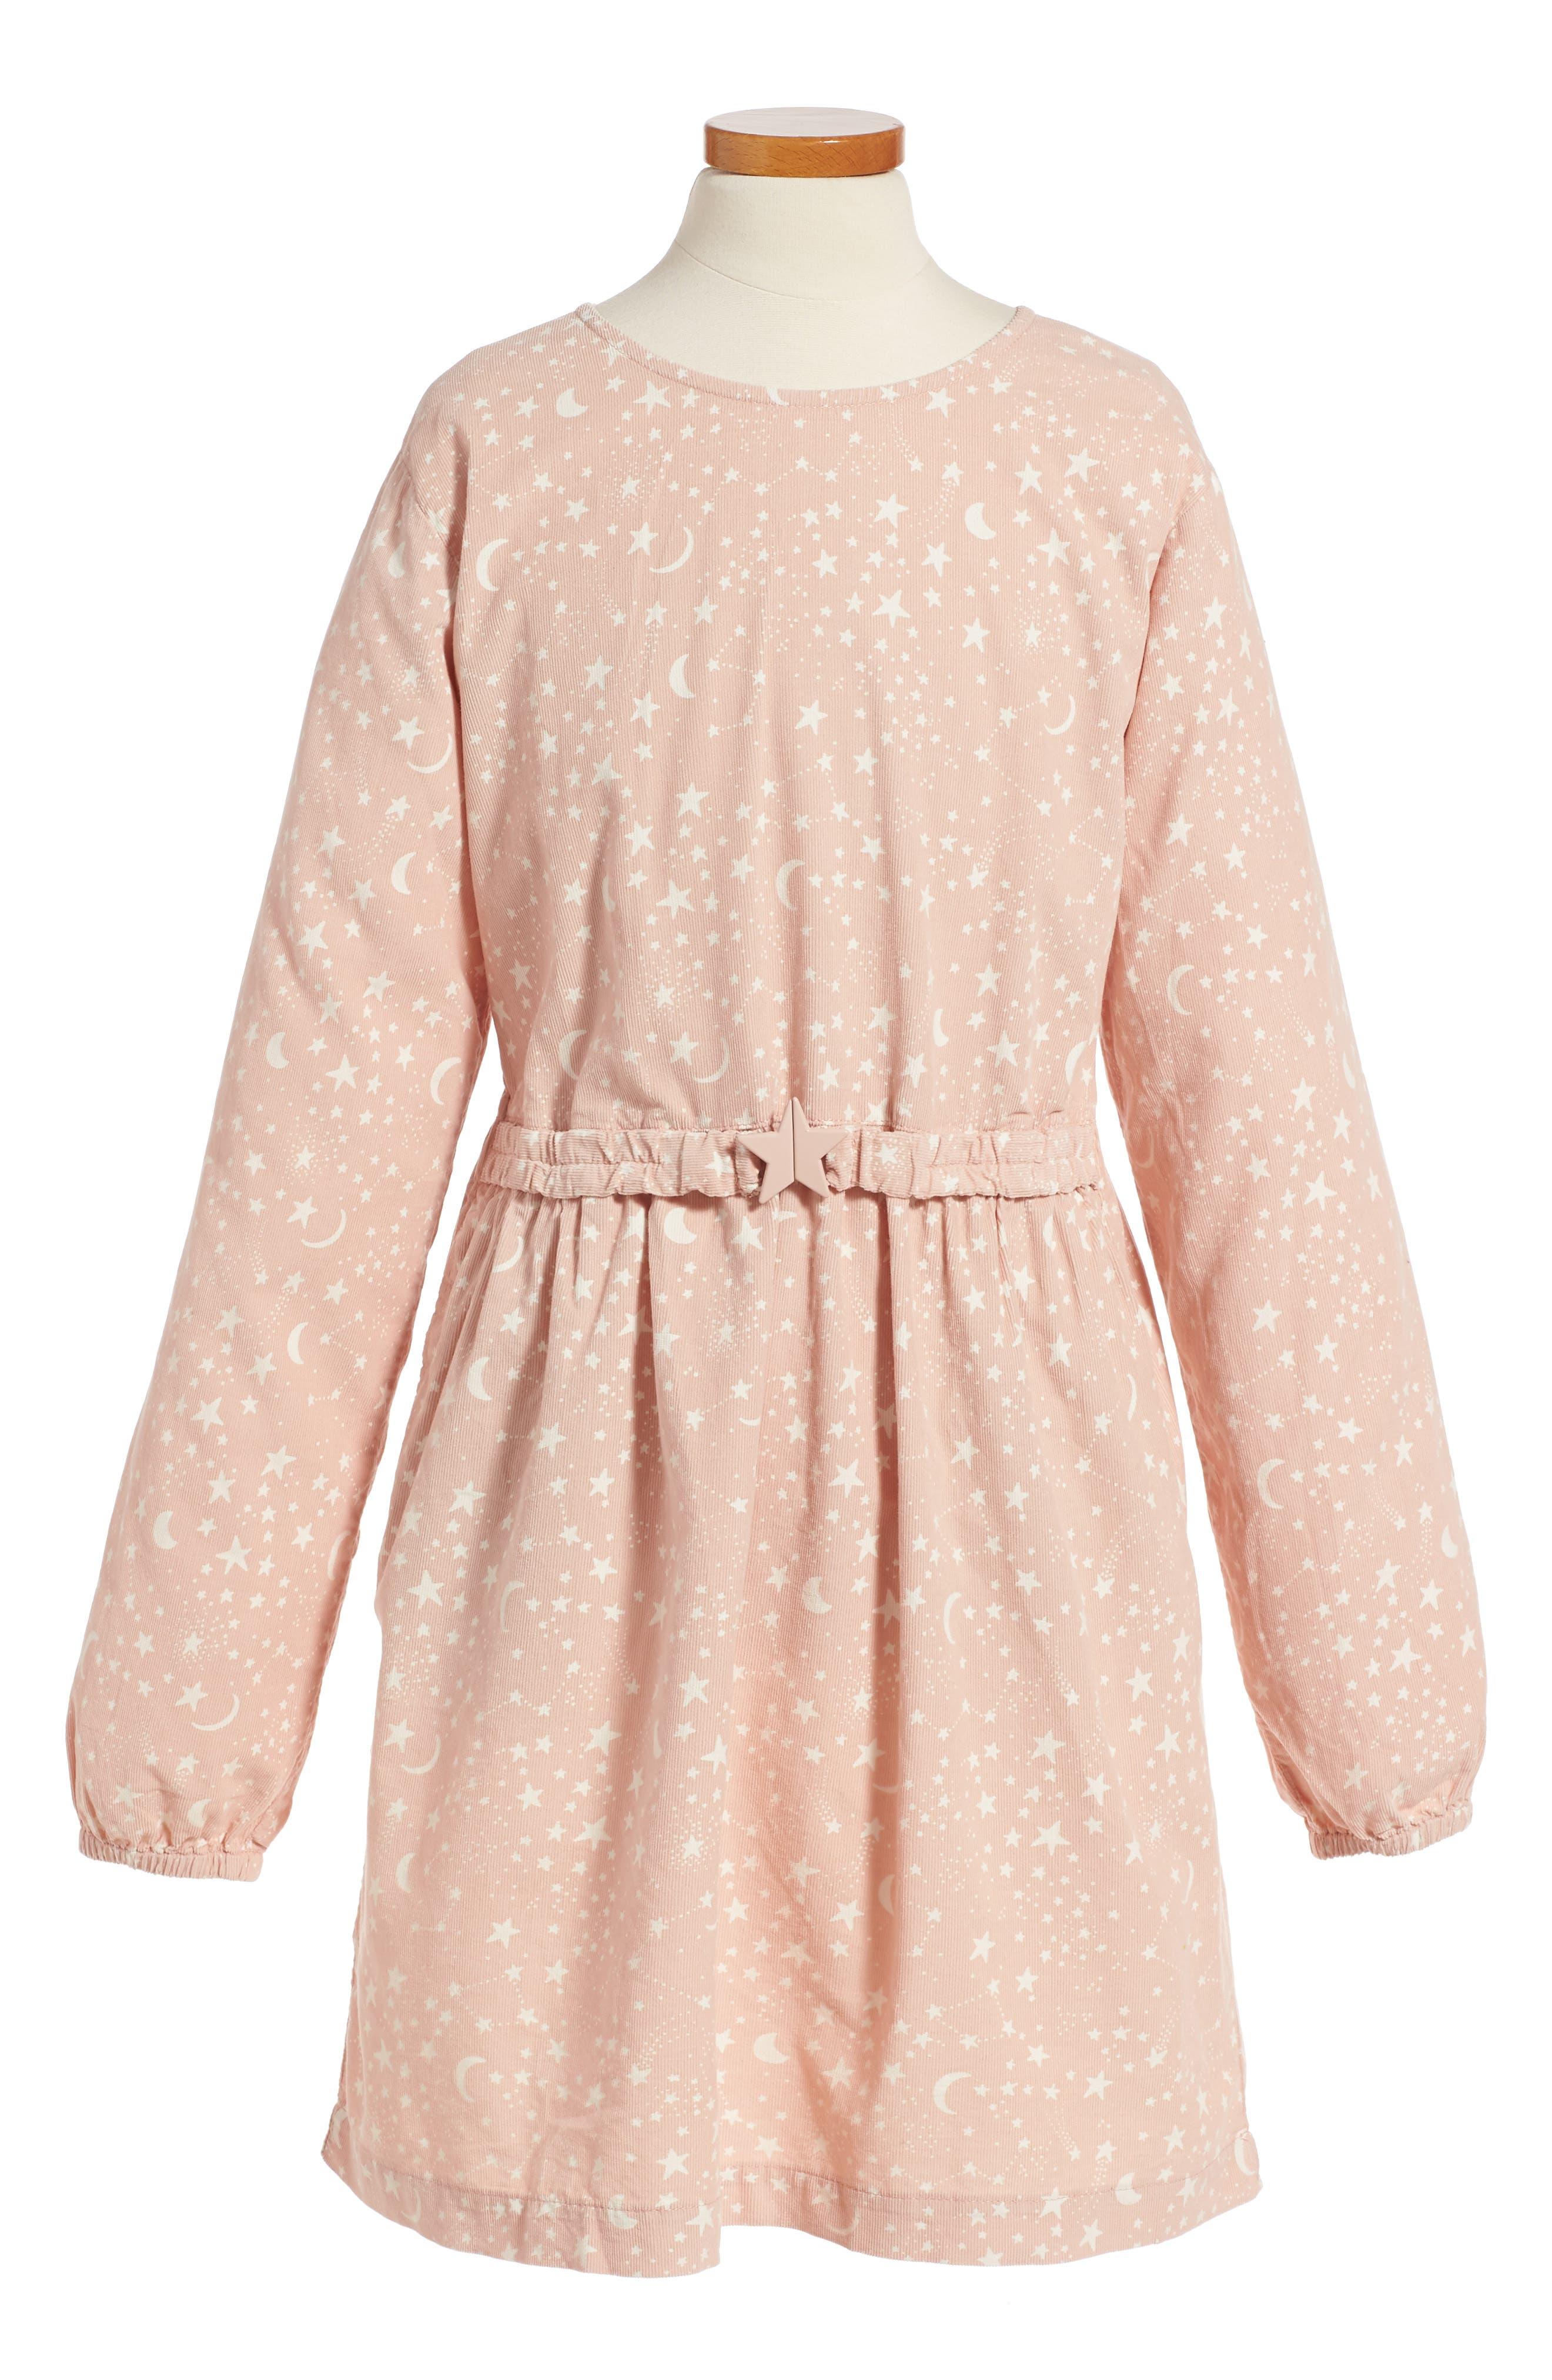 Kids Skippy Star Print Dress,                         Main,                         color, Pink